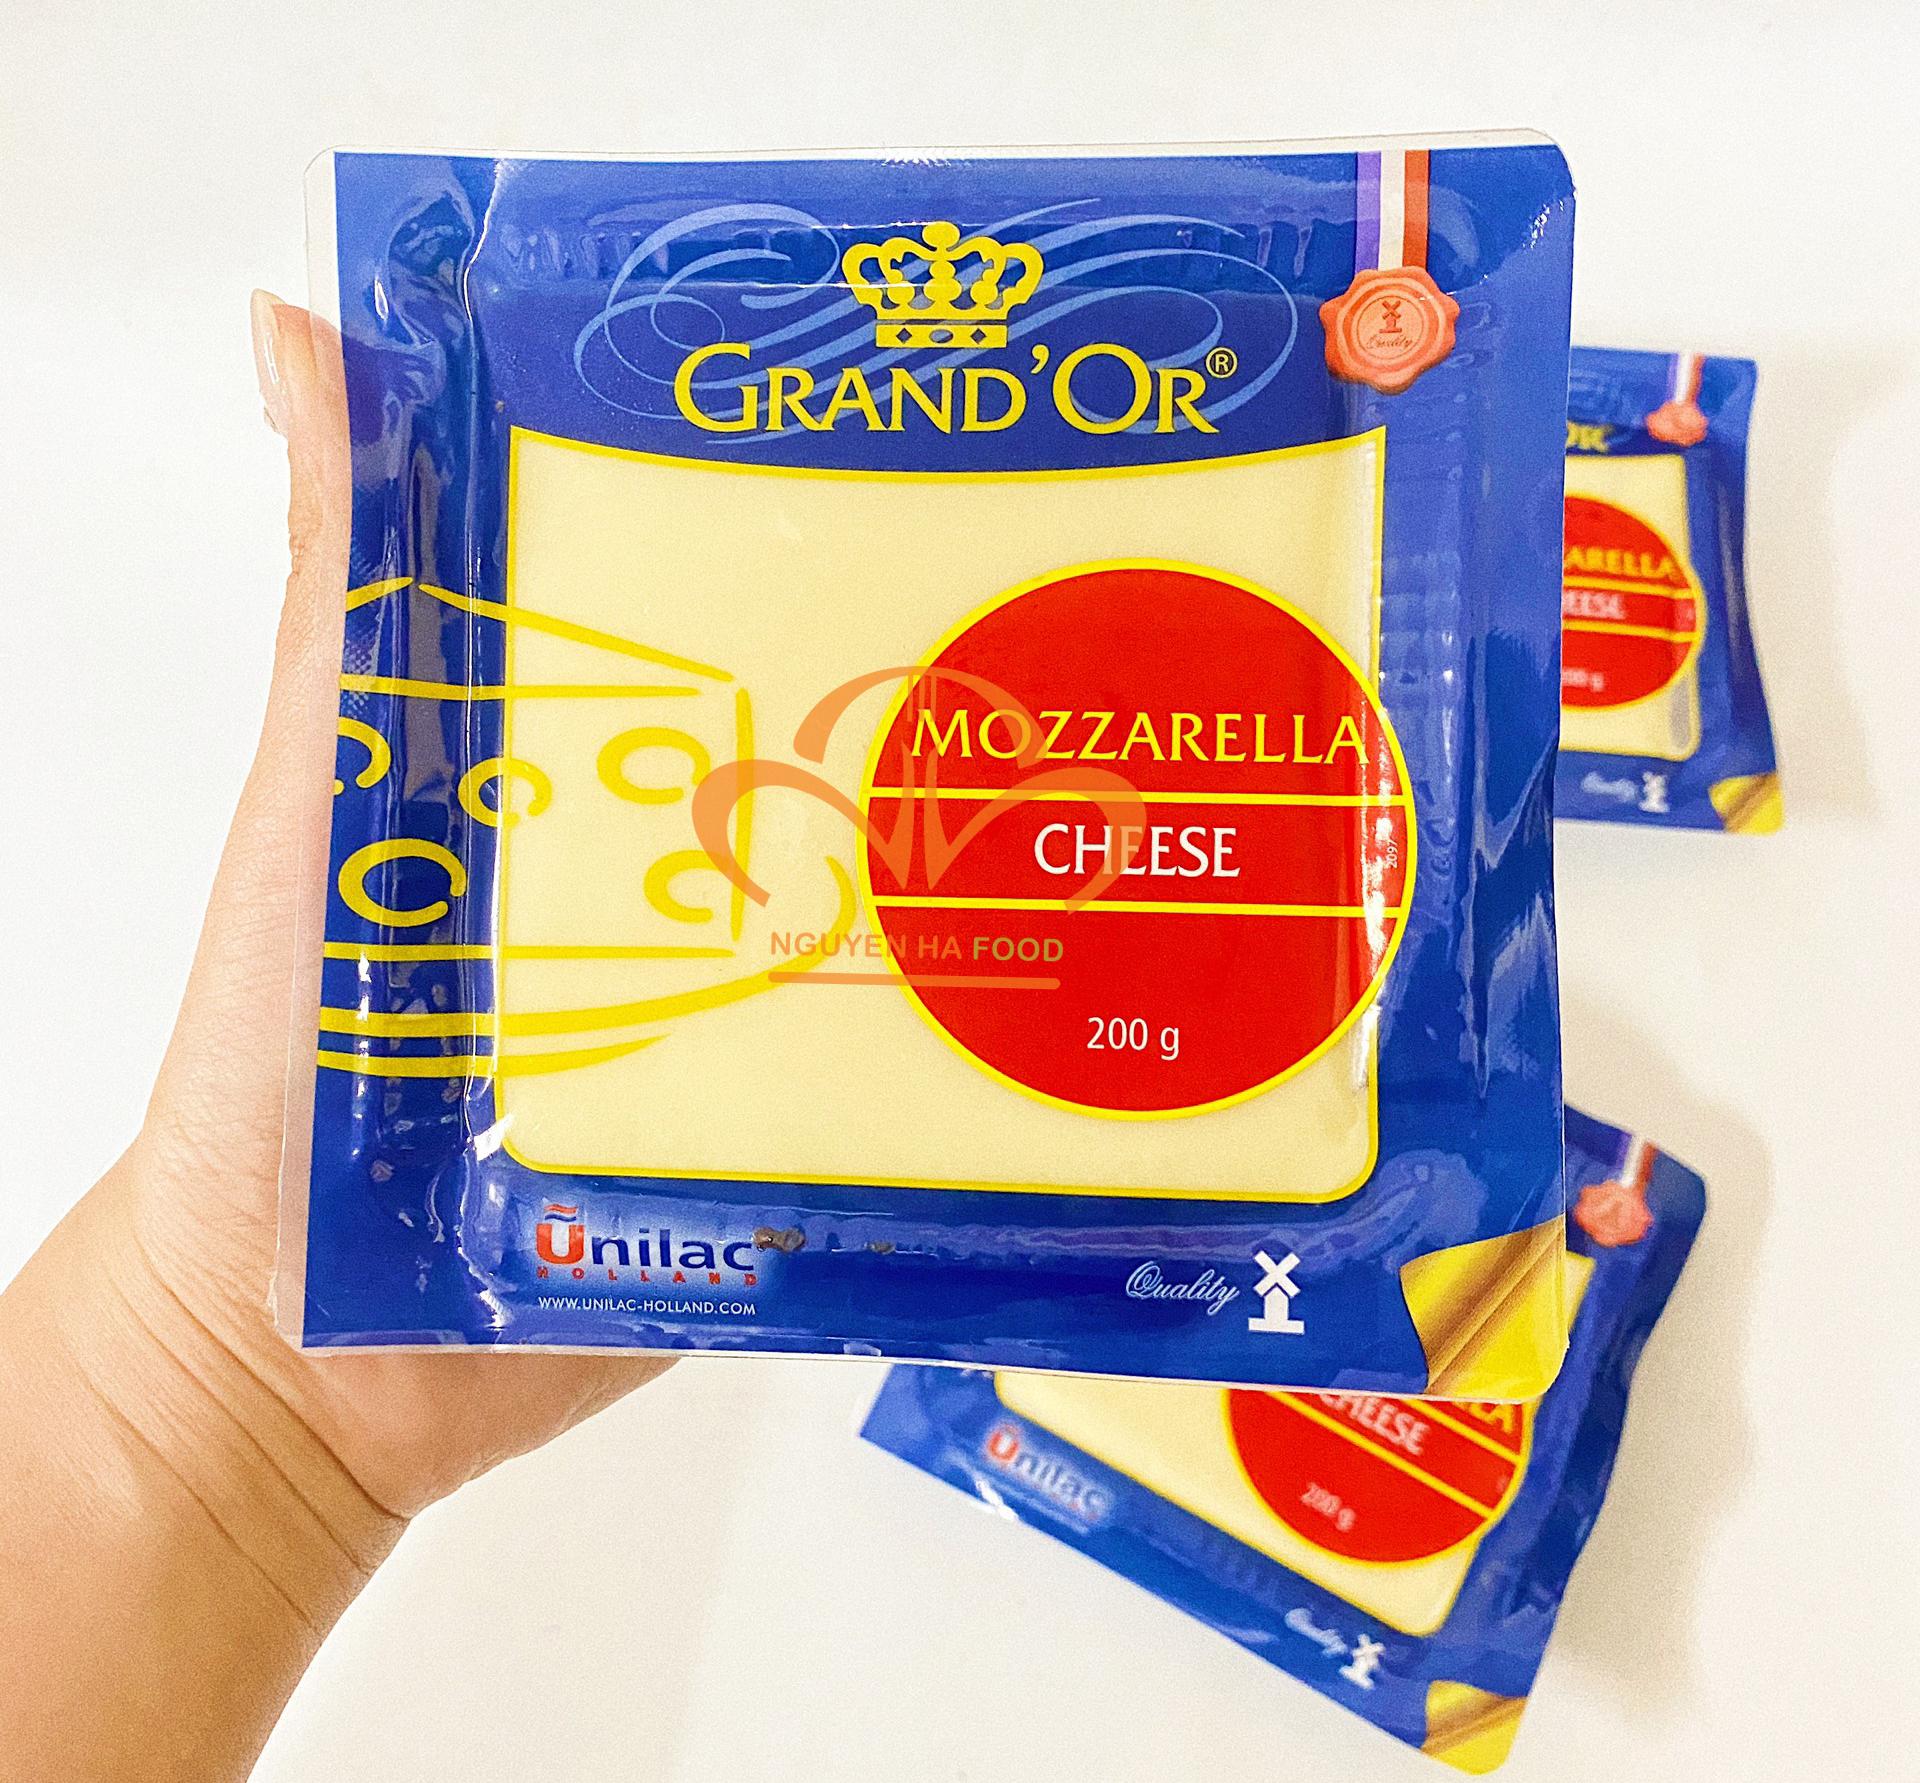 PHO MAI GRAND OR MOZZARELLA 200G NGUYEN HA FOOD (5)